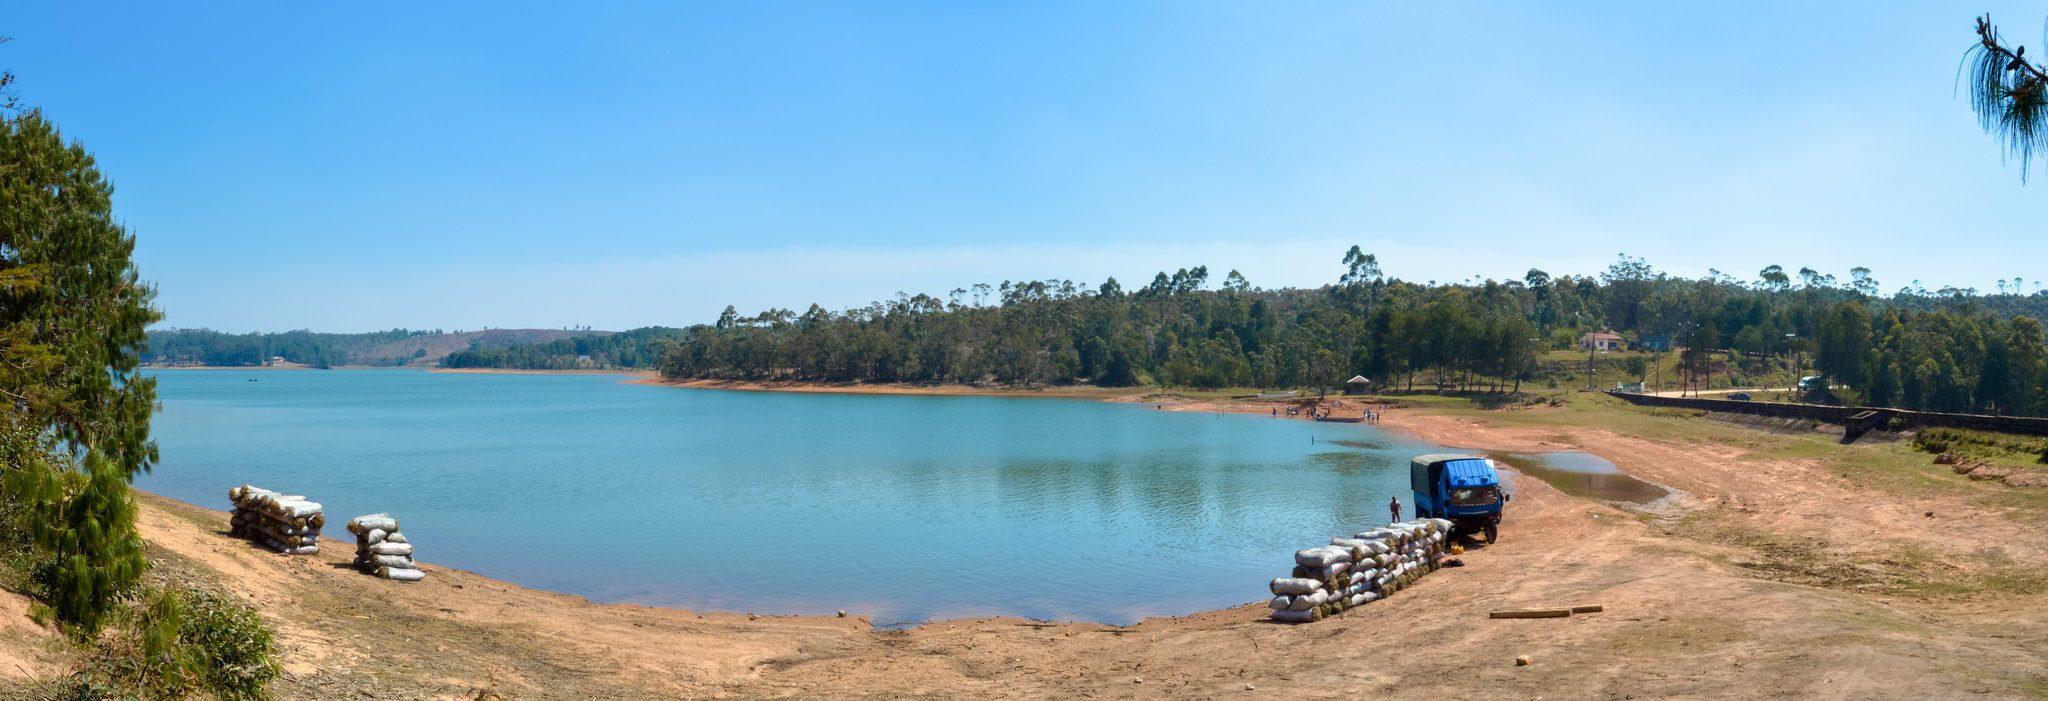 Le lac artificiel de Mantasoa, à 60 kilomètres au nord d'Antananarivo